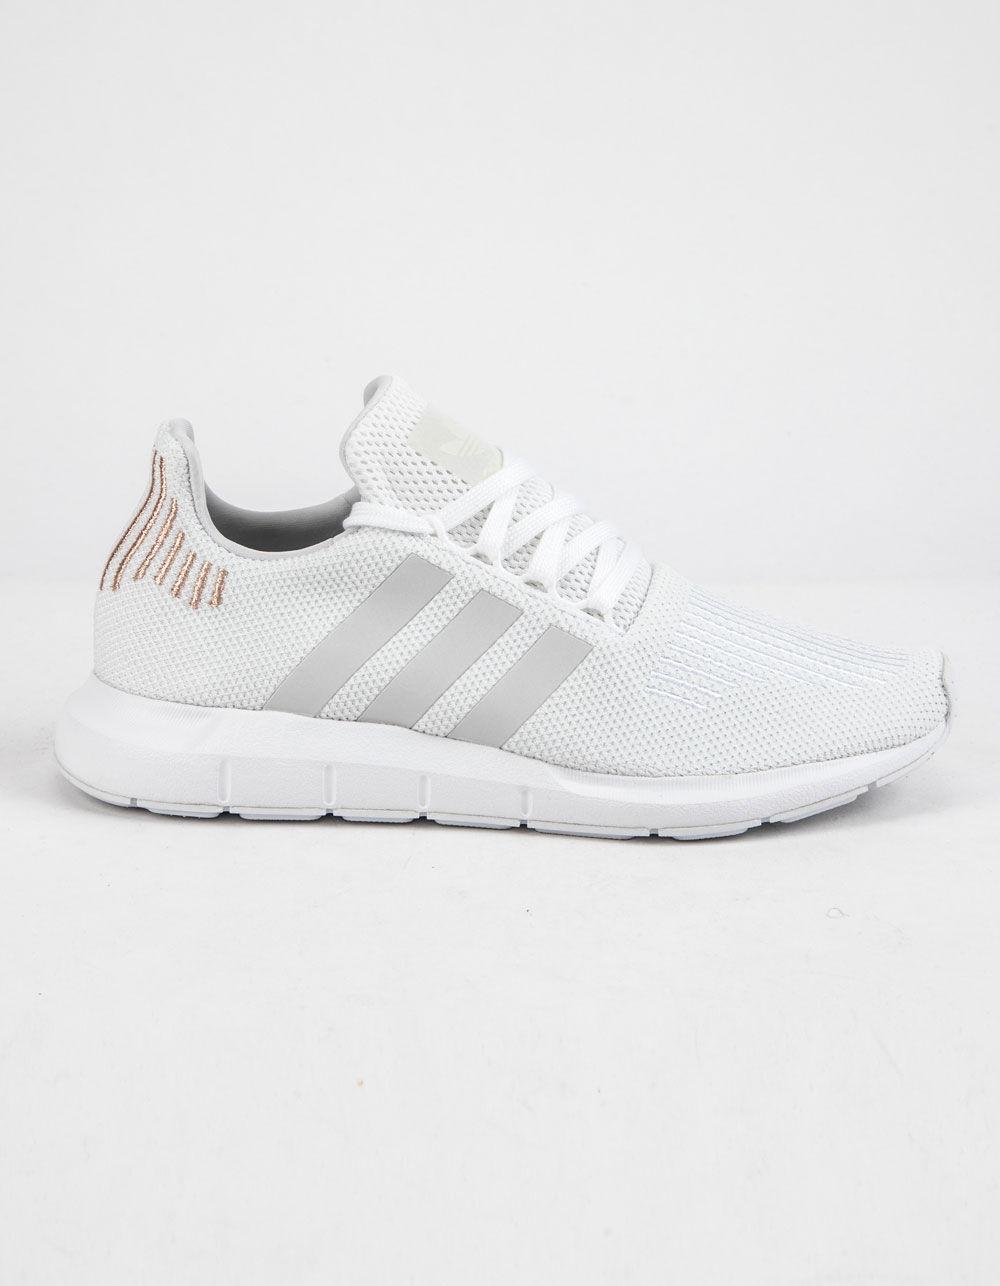 ADIDAS Swift Run Cloud White & Crystal White Shoes